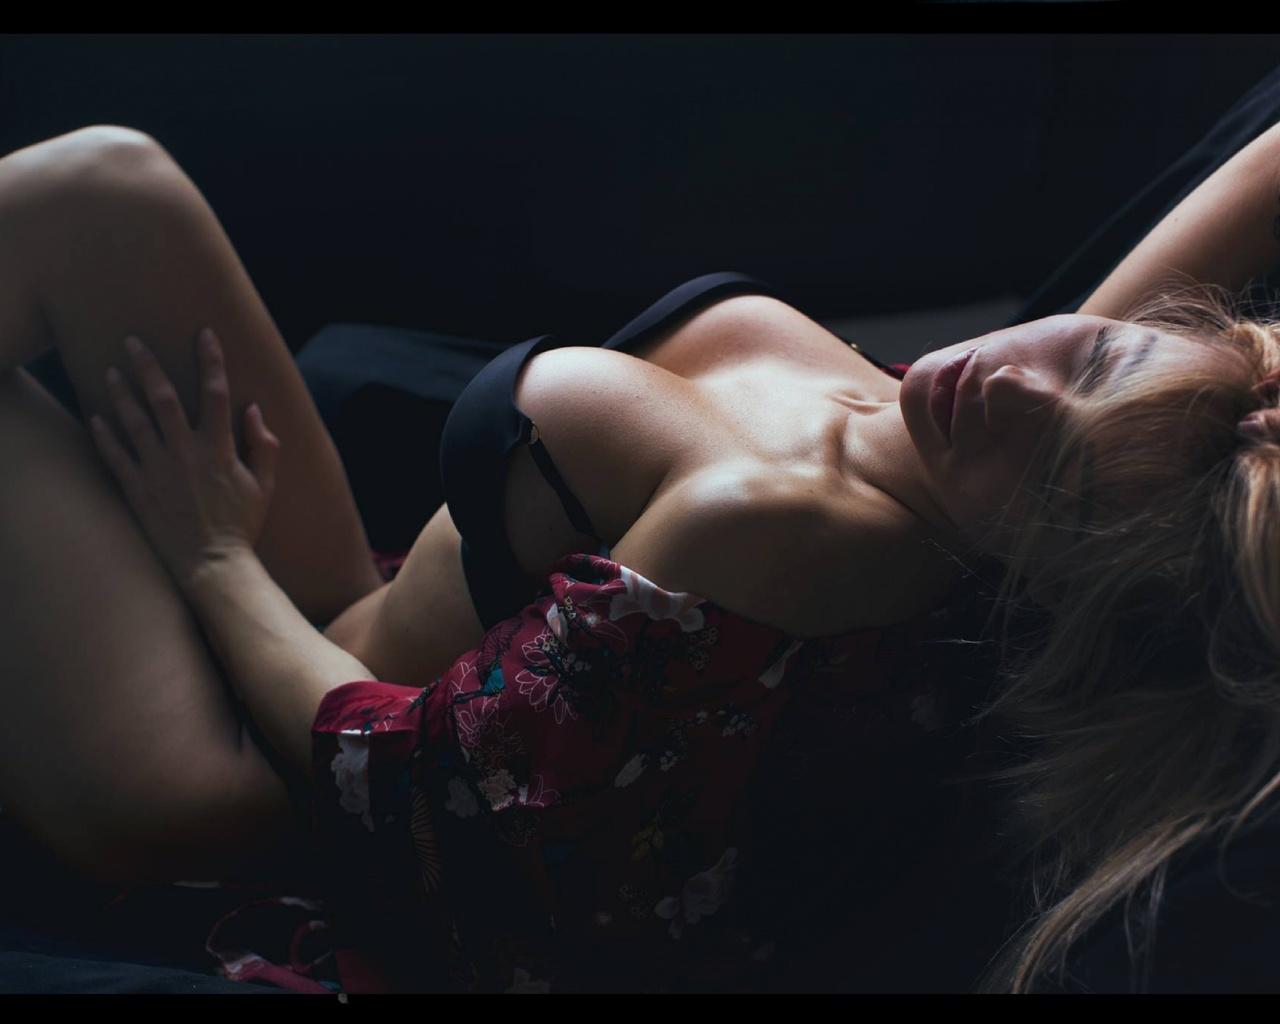 wallpaper model, boobs, closed eyes, big tits, tanned, bra, black bra